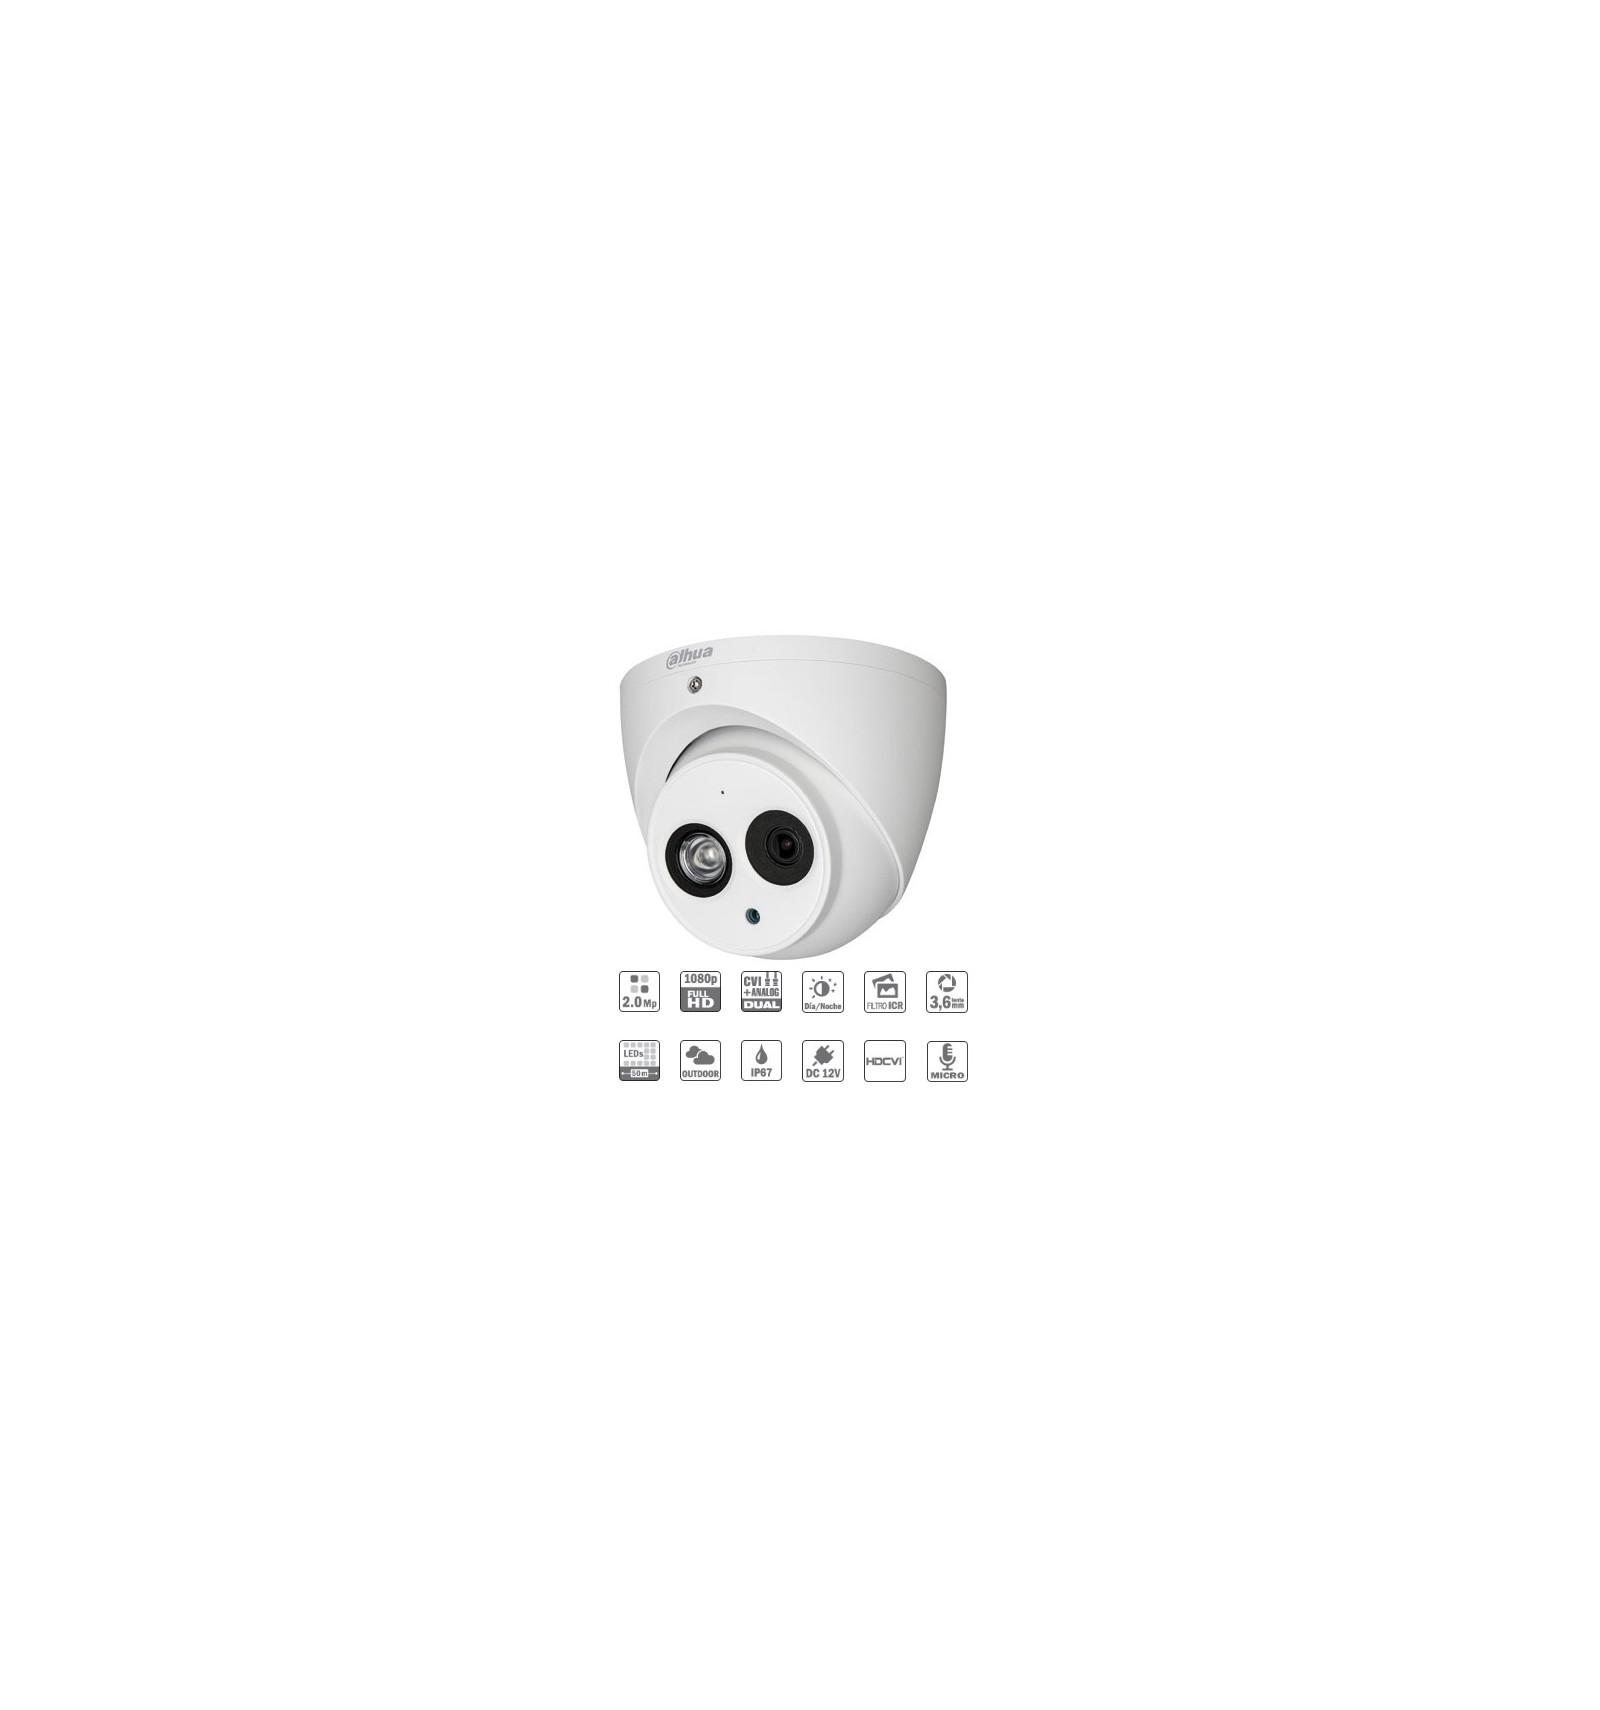 Camara de vigilancia exterior domo hdcvi 2m 1080p dn icr for Camara vigilancia exterior